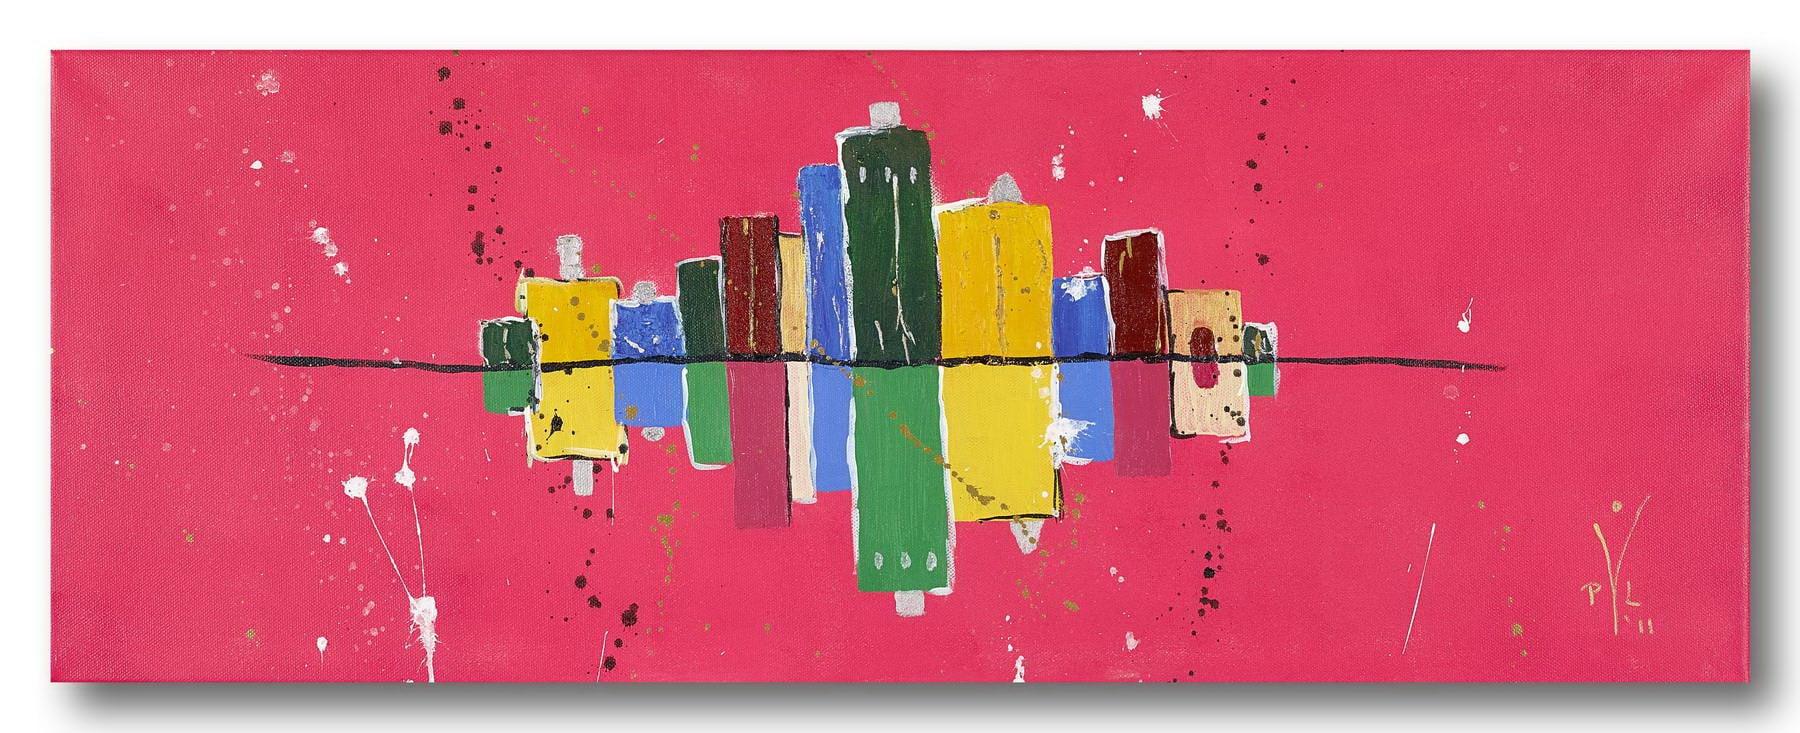 Skyline Magenta - Acrylic / Canvas 80 x 30 cm, 31.5 x 11.81 inch